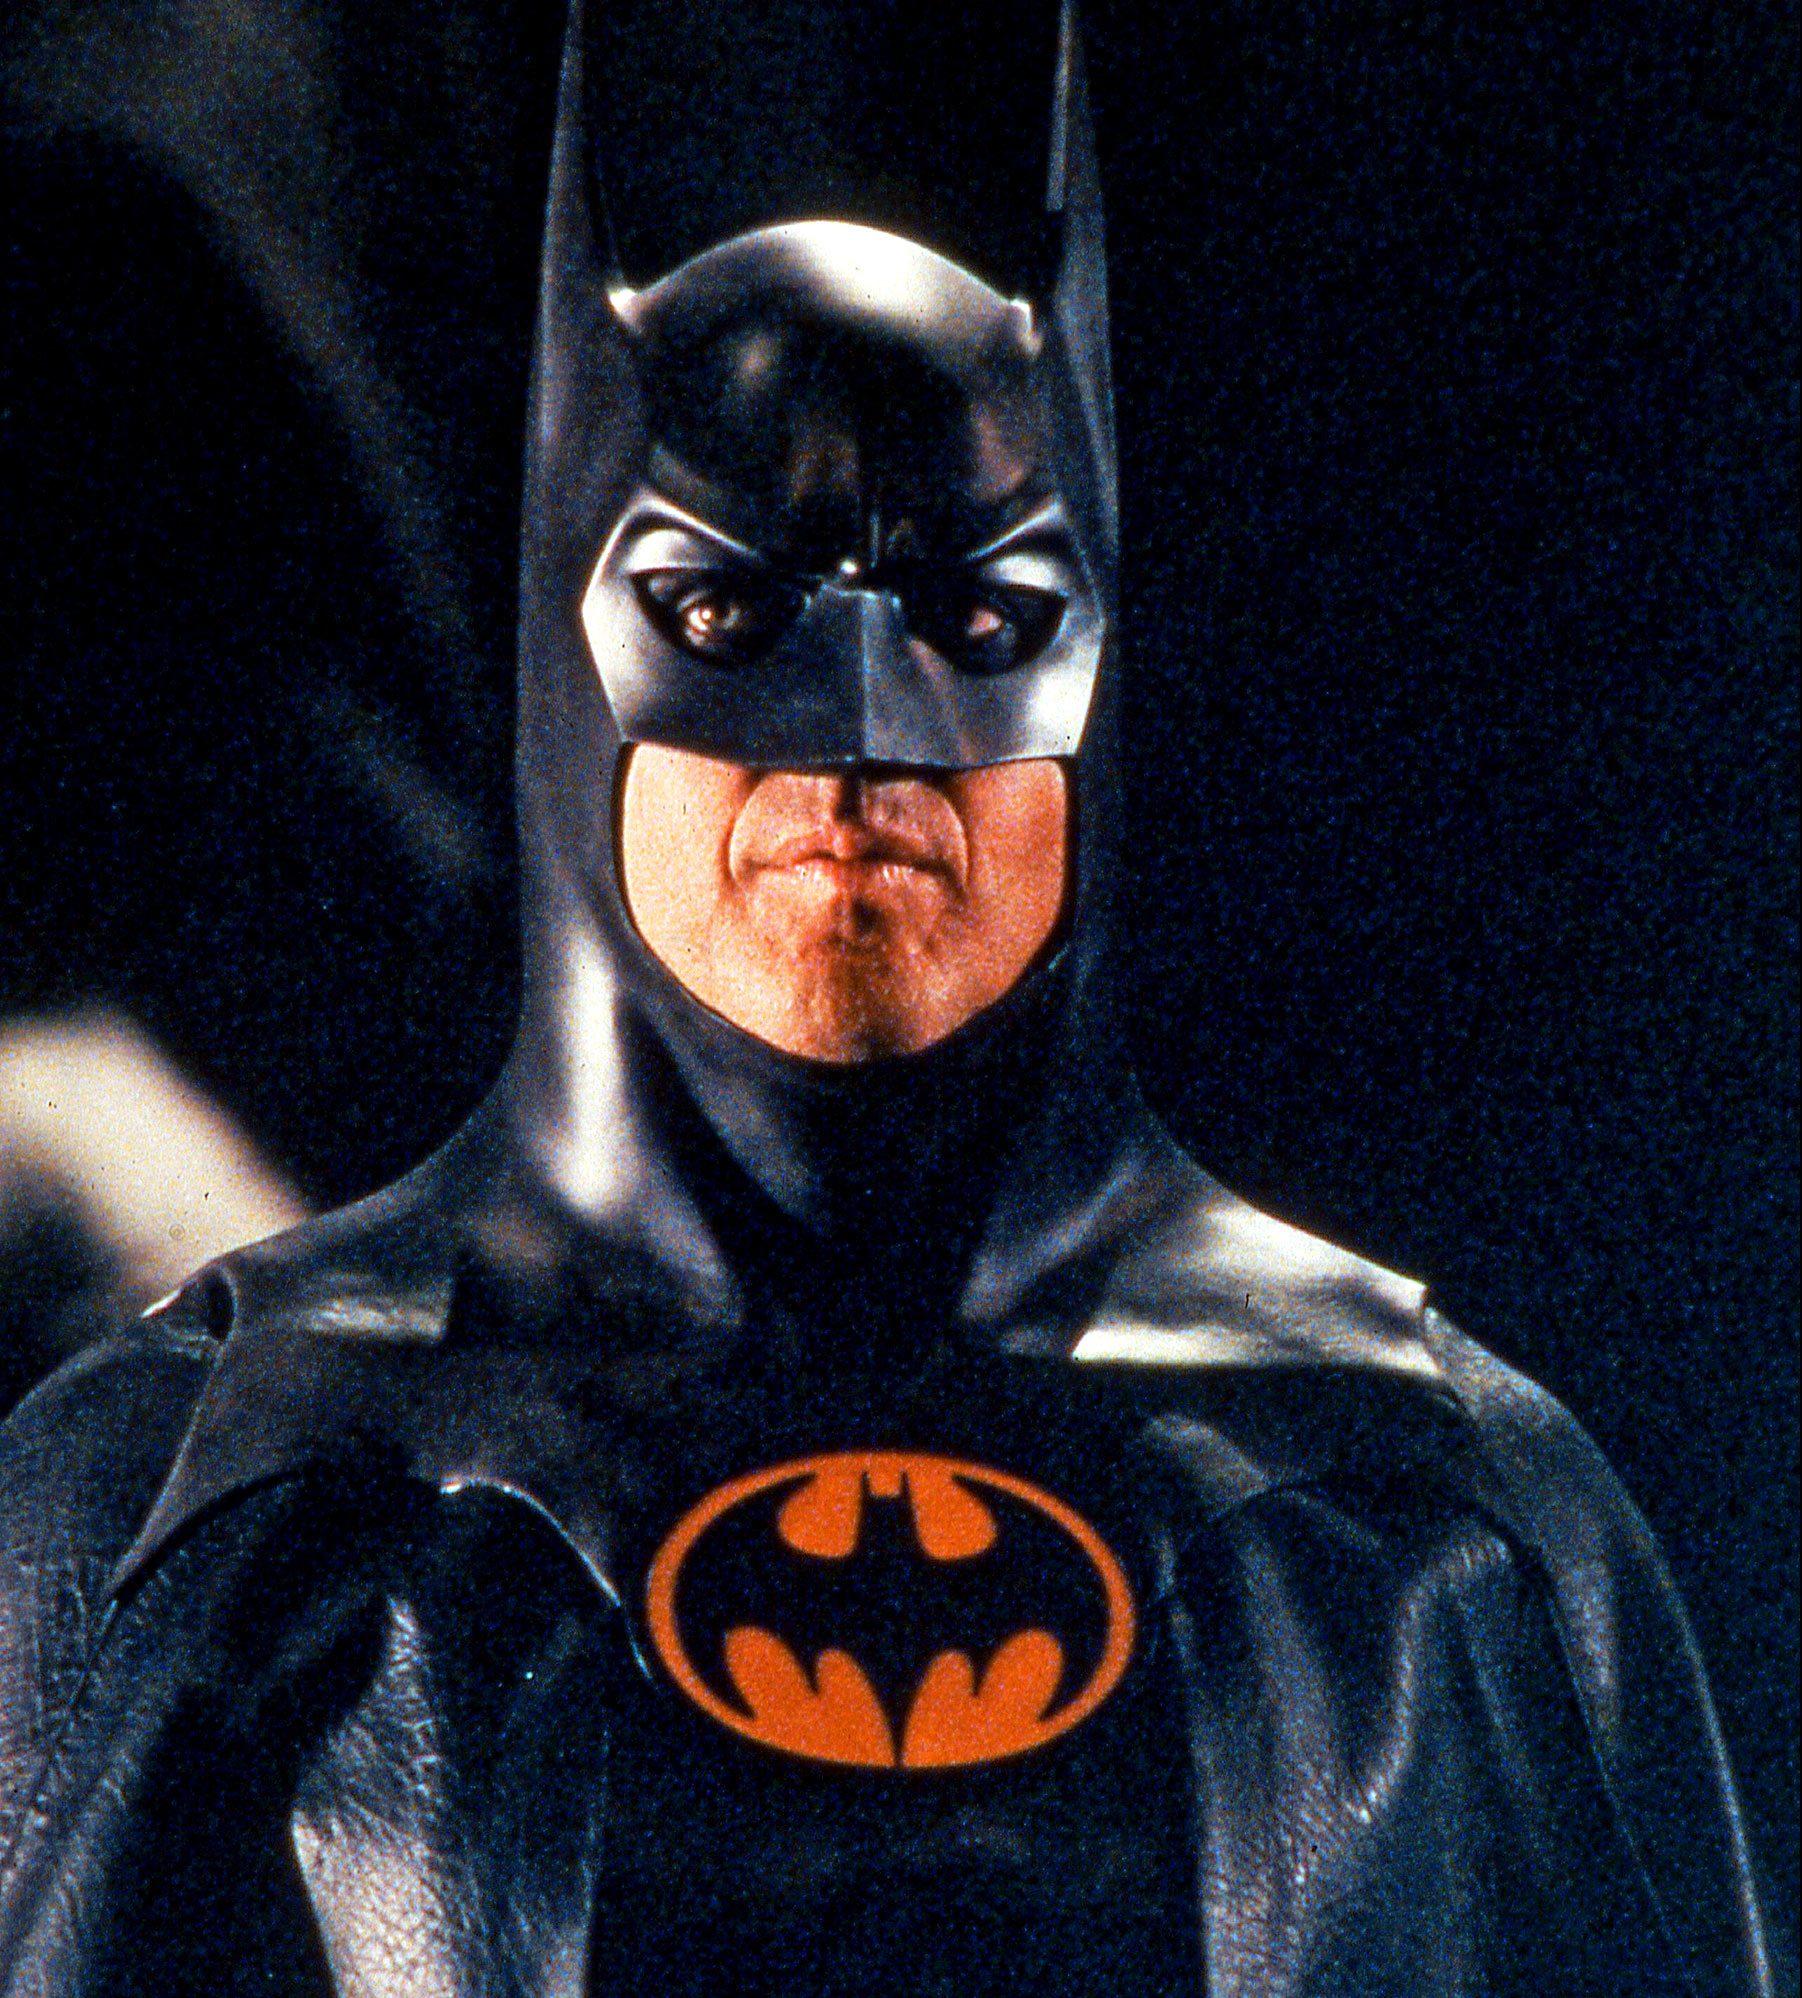 batman returns e1570442800958 Michael Keaton In Talks To Play Batman Again In New DC Movies